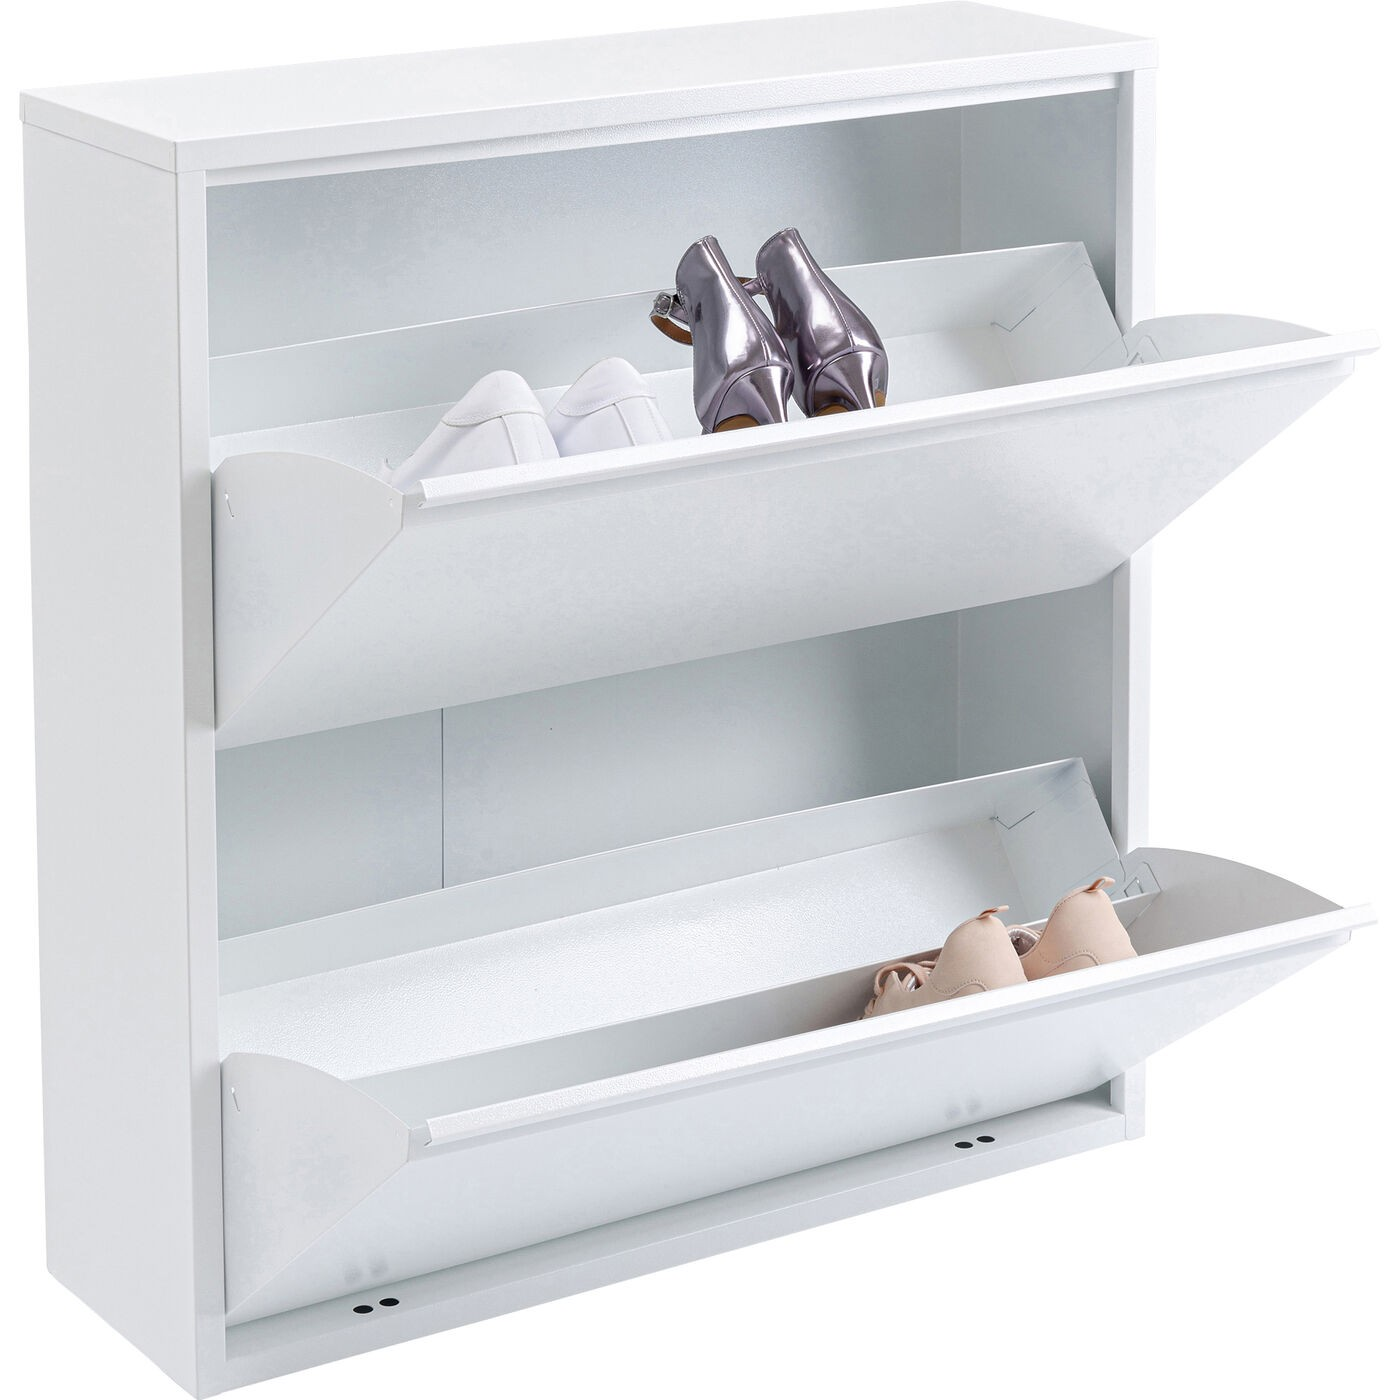 Casier à chaussures Caruso blanc 2 tiroirs Kare Design